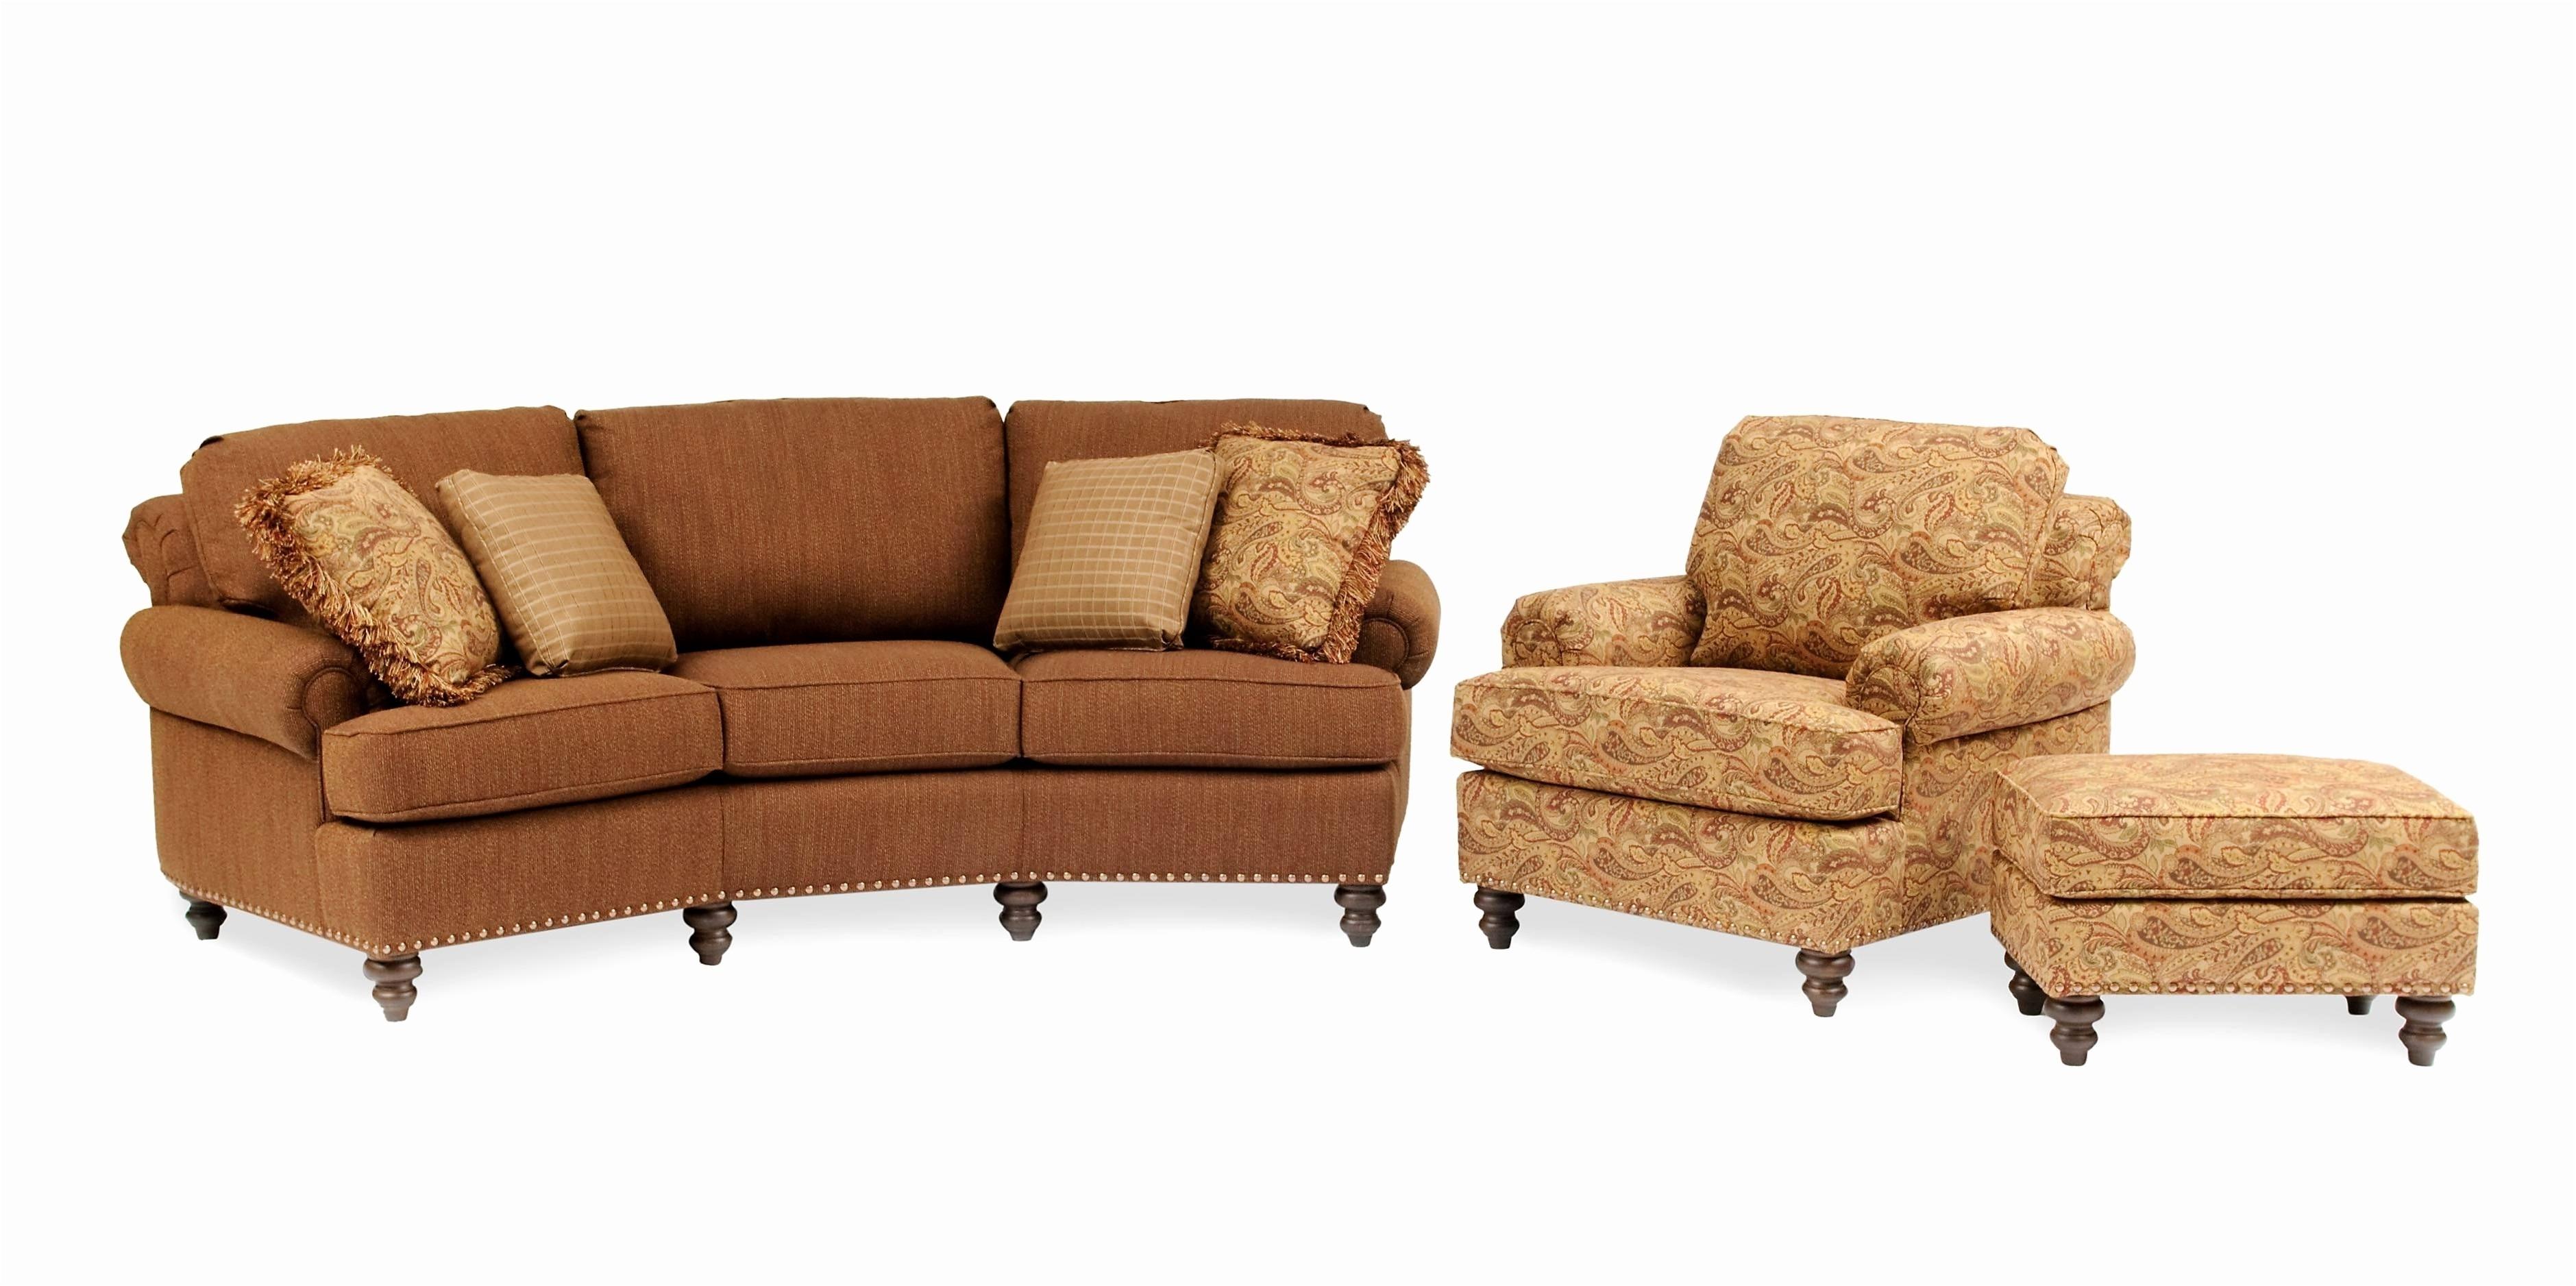 Most Popular Sofa : Nebraska Furniture Mart Sectional Sofa Cinematic Everest For Nebraska Furniture Mart Sectional Sofas (View 12 of 15)